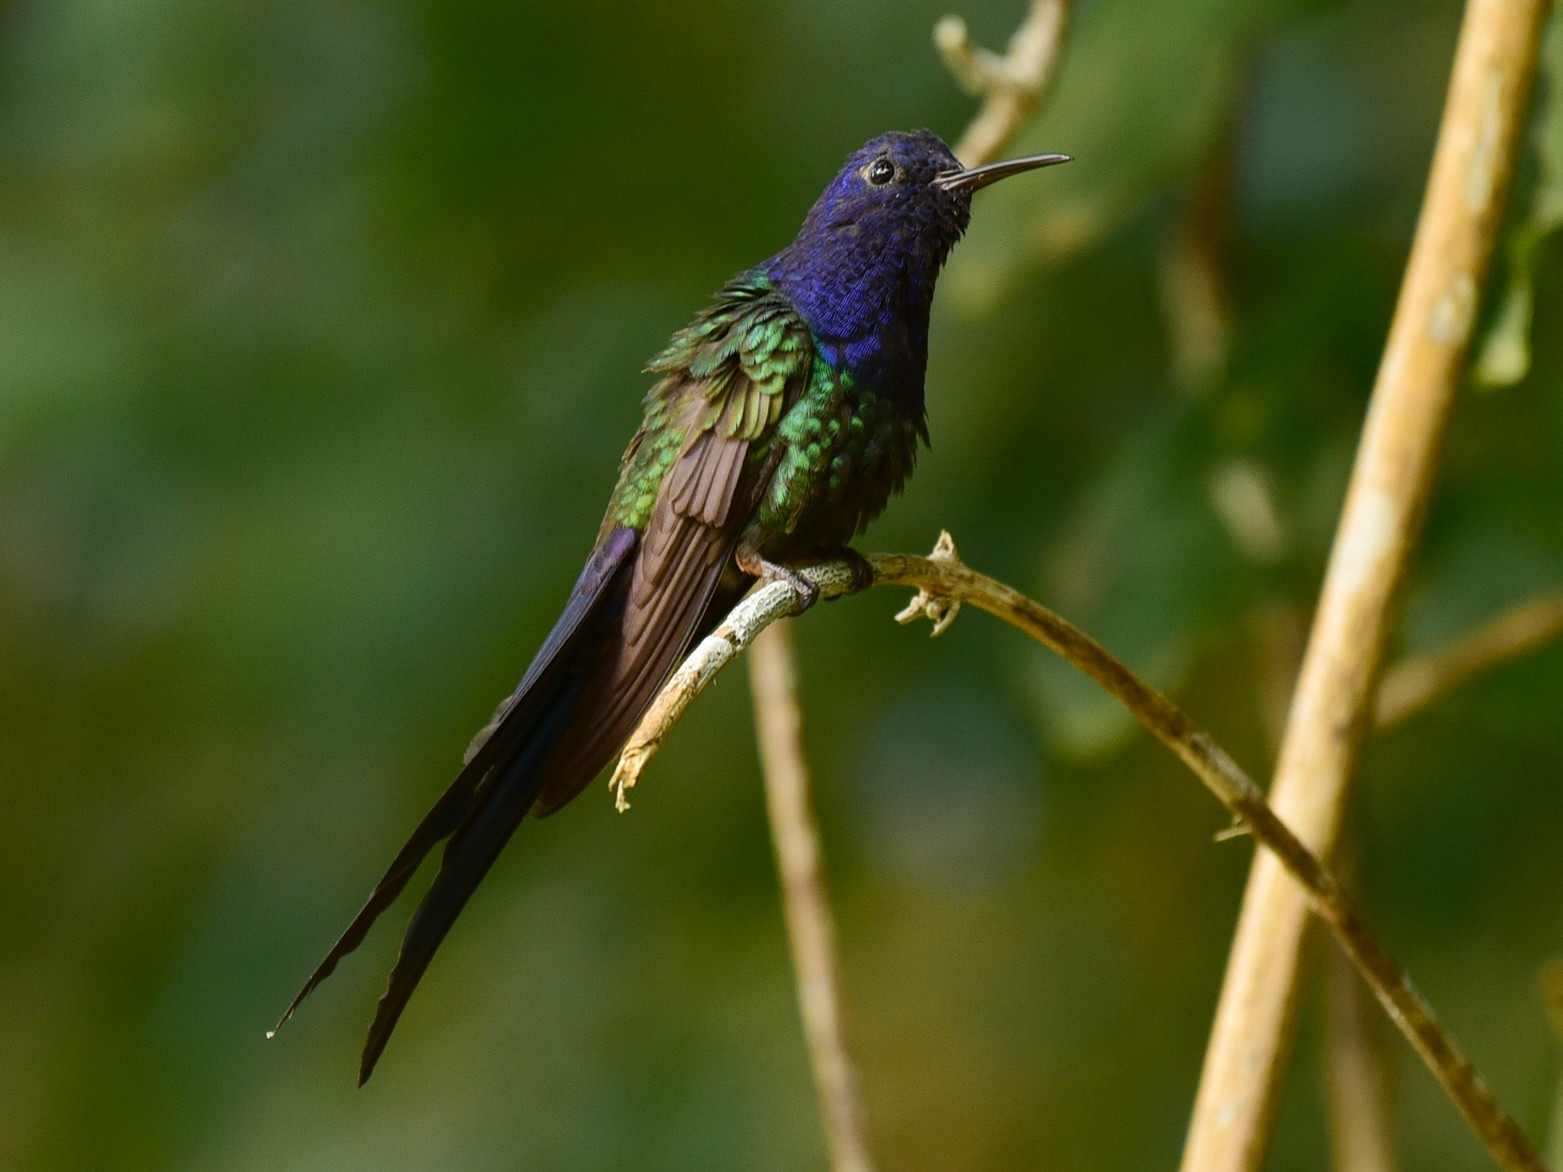 Swallow-tailed Hummingbird - Luiz Moschini